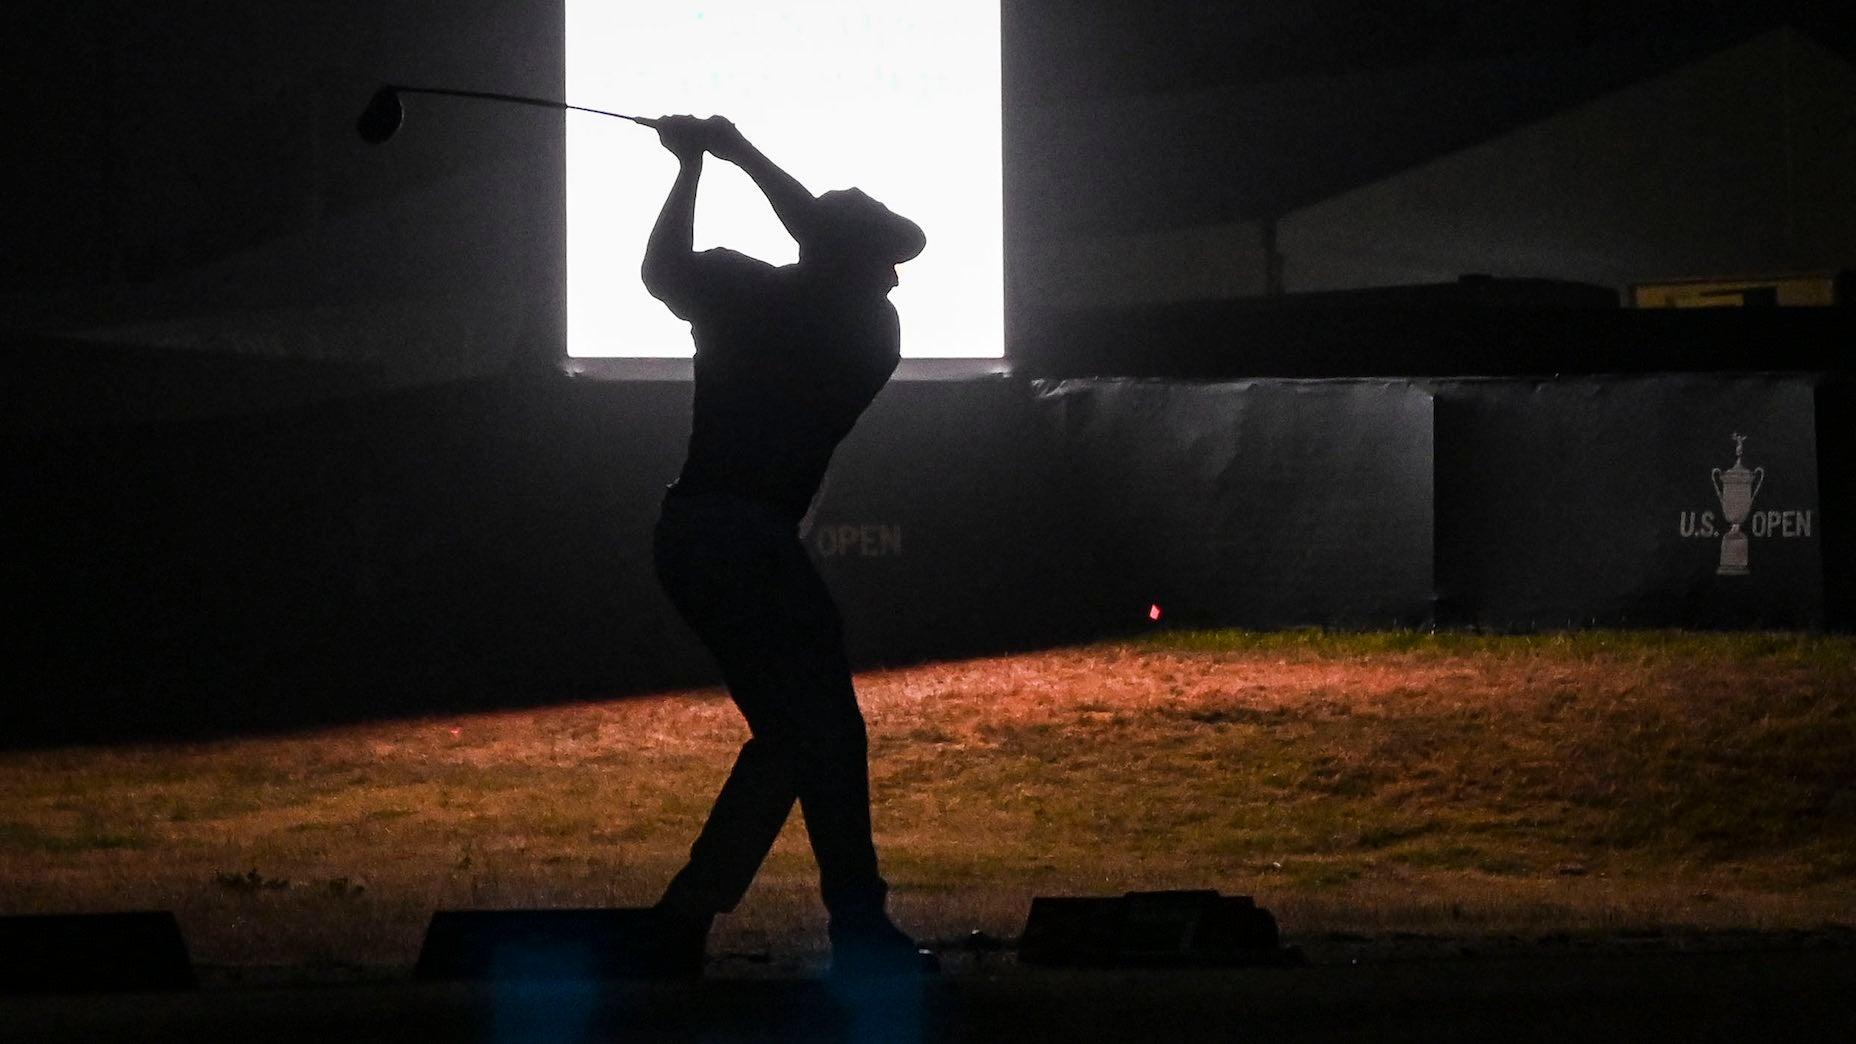 Bryson DeChambeau hit range balls well past dark on Thursday at the U.S. Open.